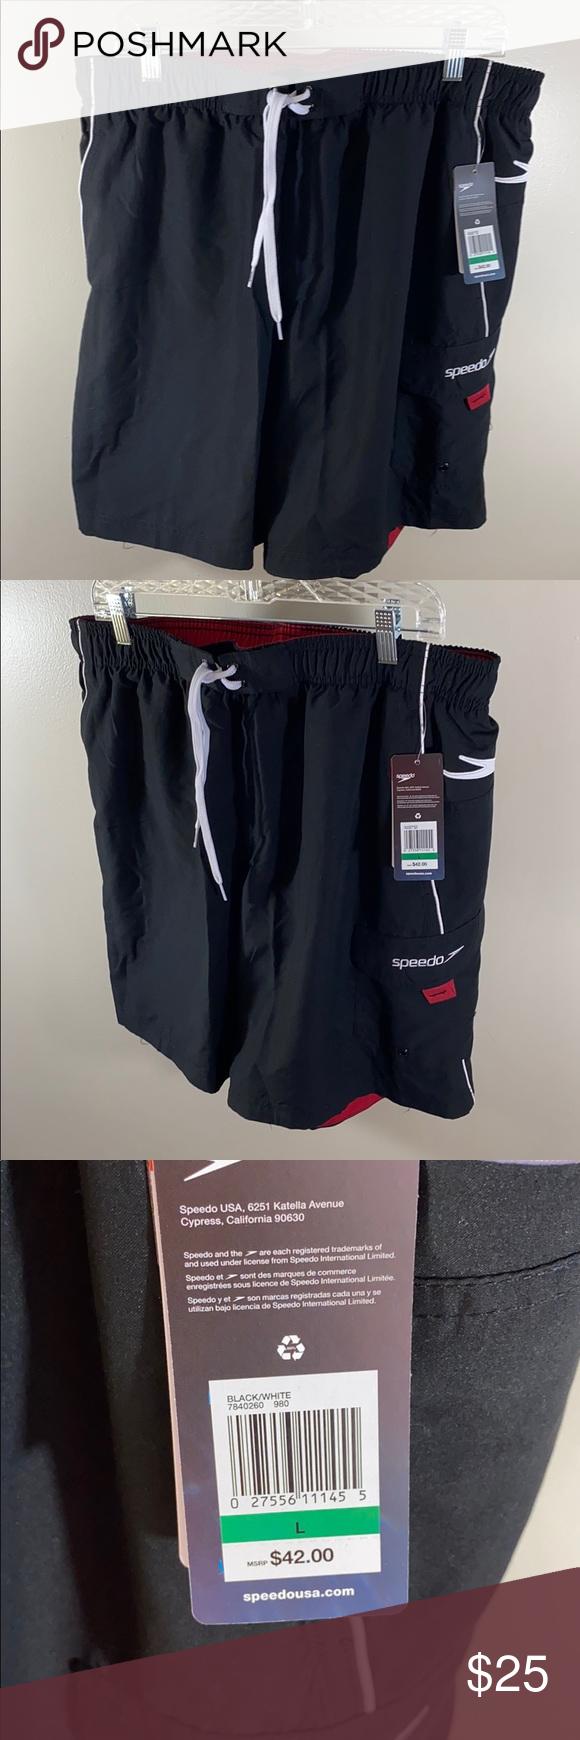 Speedo Men's bathing suit. NWT Speedo trunks. Sleek black and red. Size large. NWT  M-127 Speedo Swim Swim Trunks #mensbathingsuits Speedo Men's bathing suit. NWT Speedo trunks. Sleek black and red. Size large. NWT  M-127 Speedo Swim Swim Trunks #mensbathingsuits